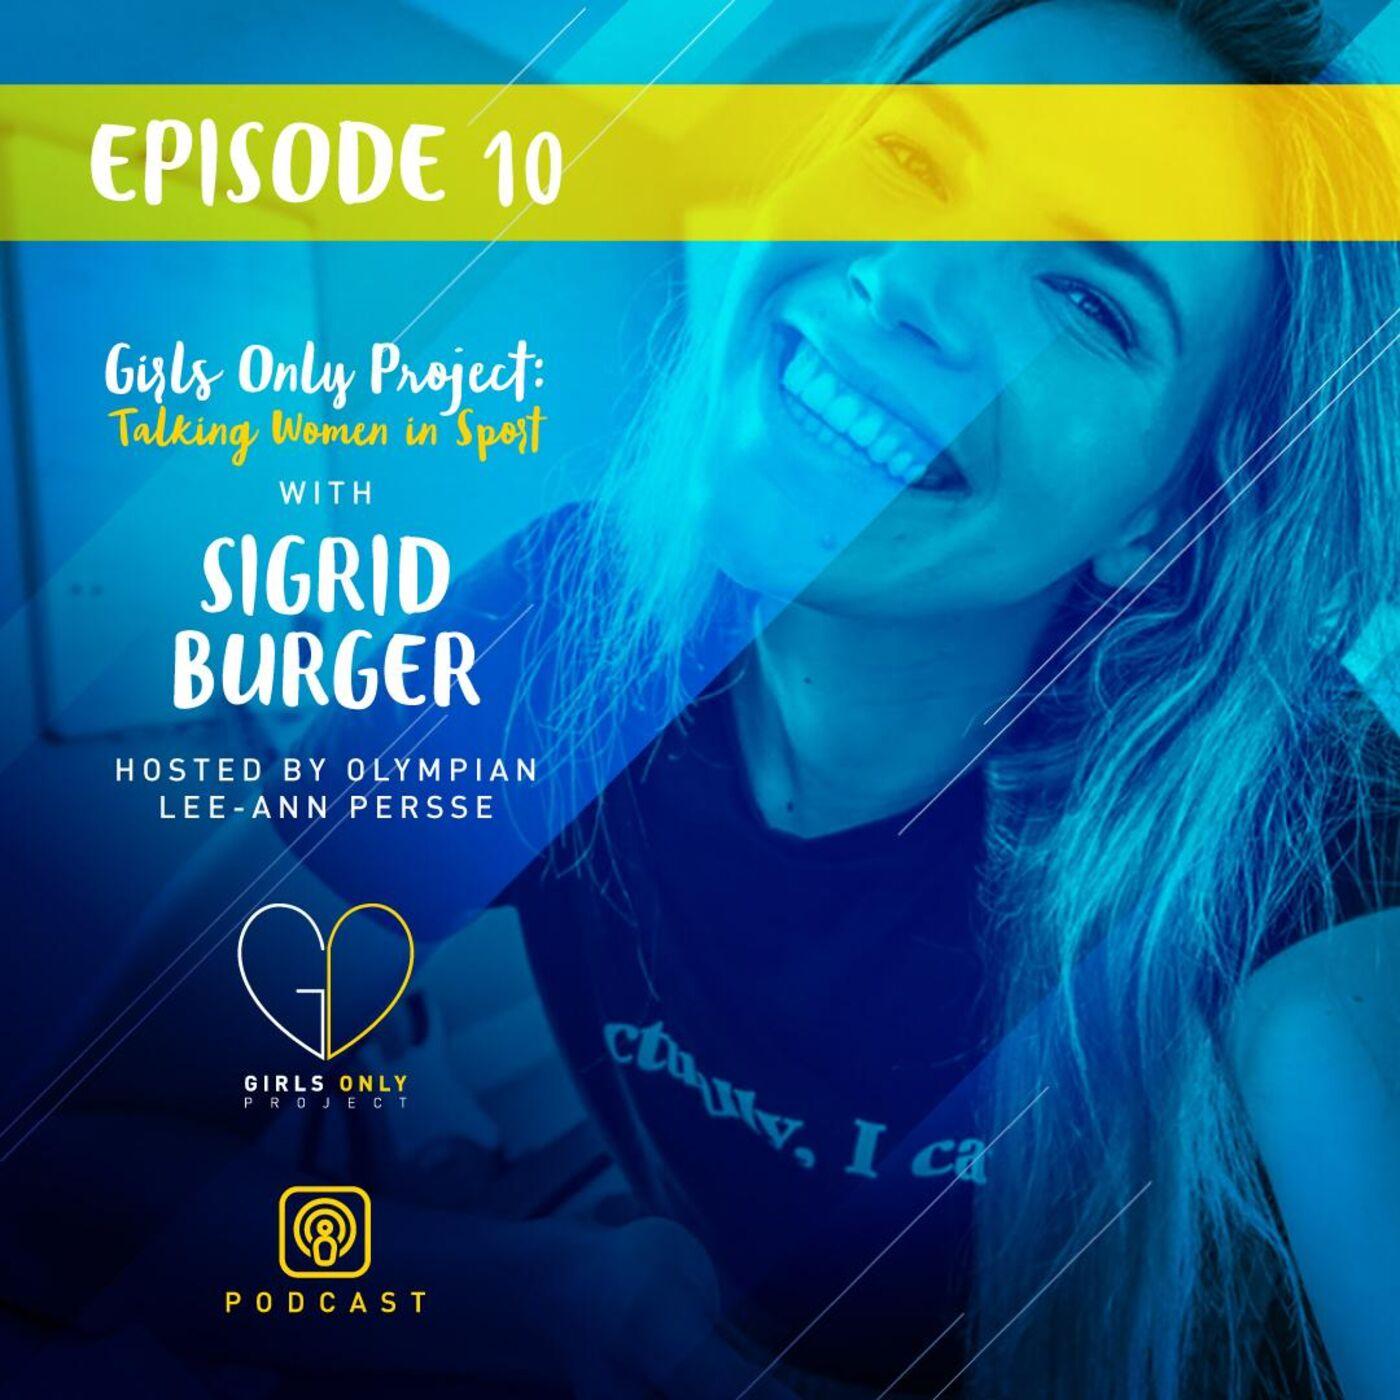 Sigi Burger